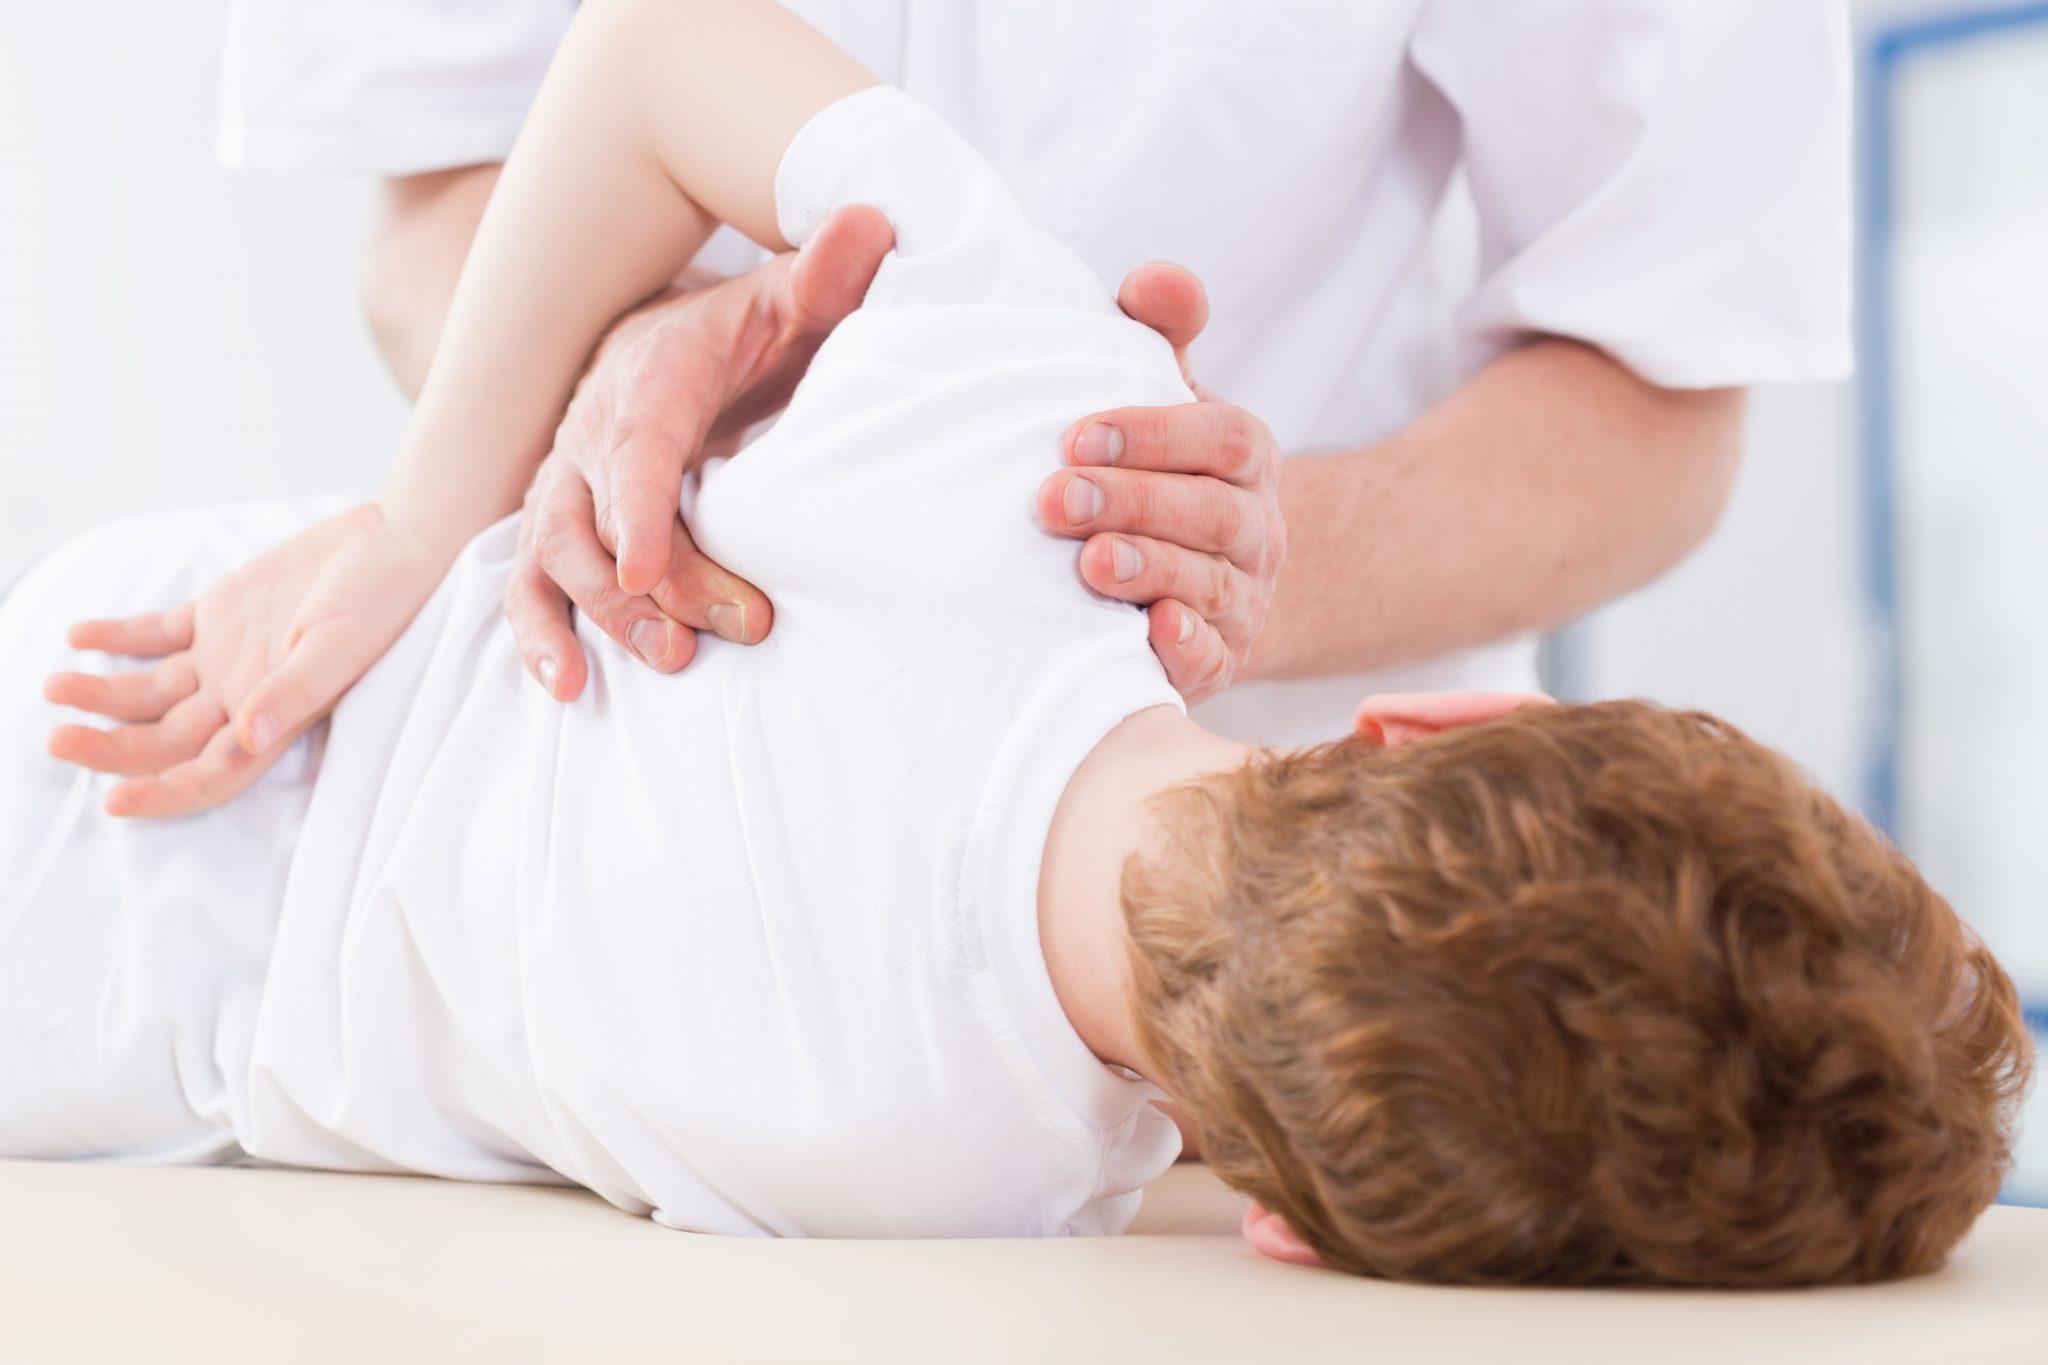 especialista en terapia manual osteopatia